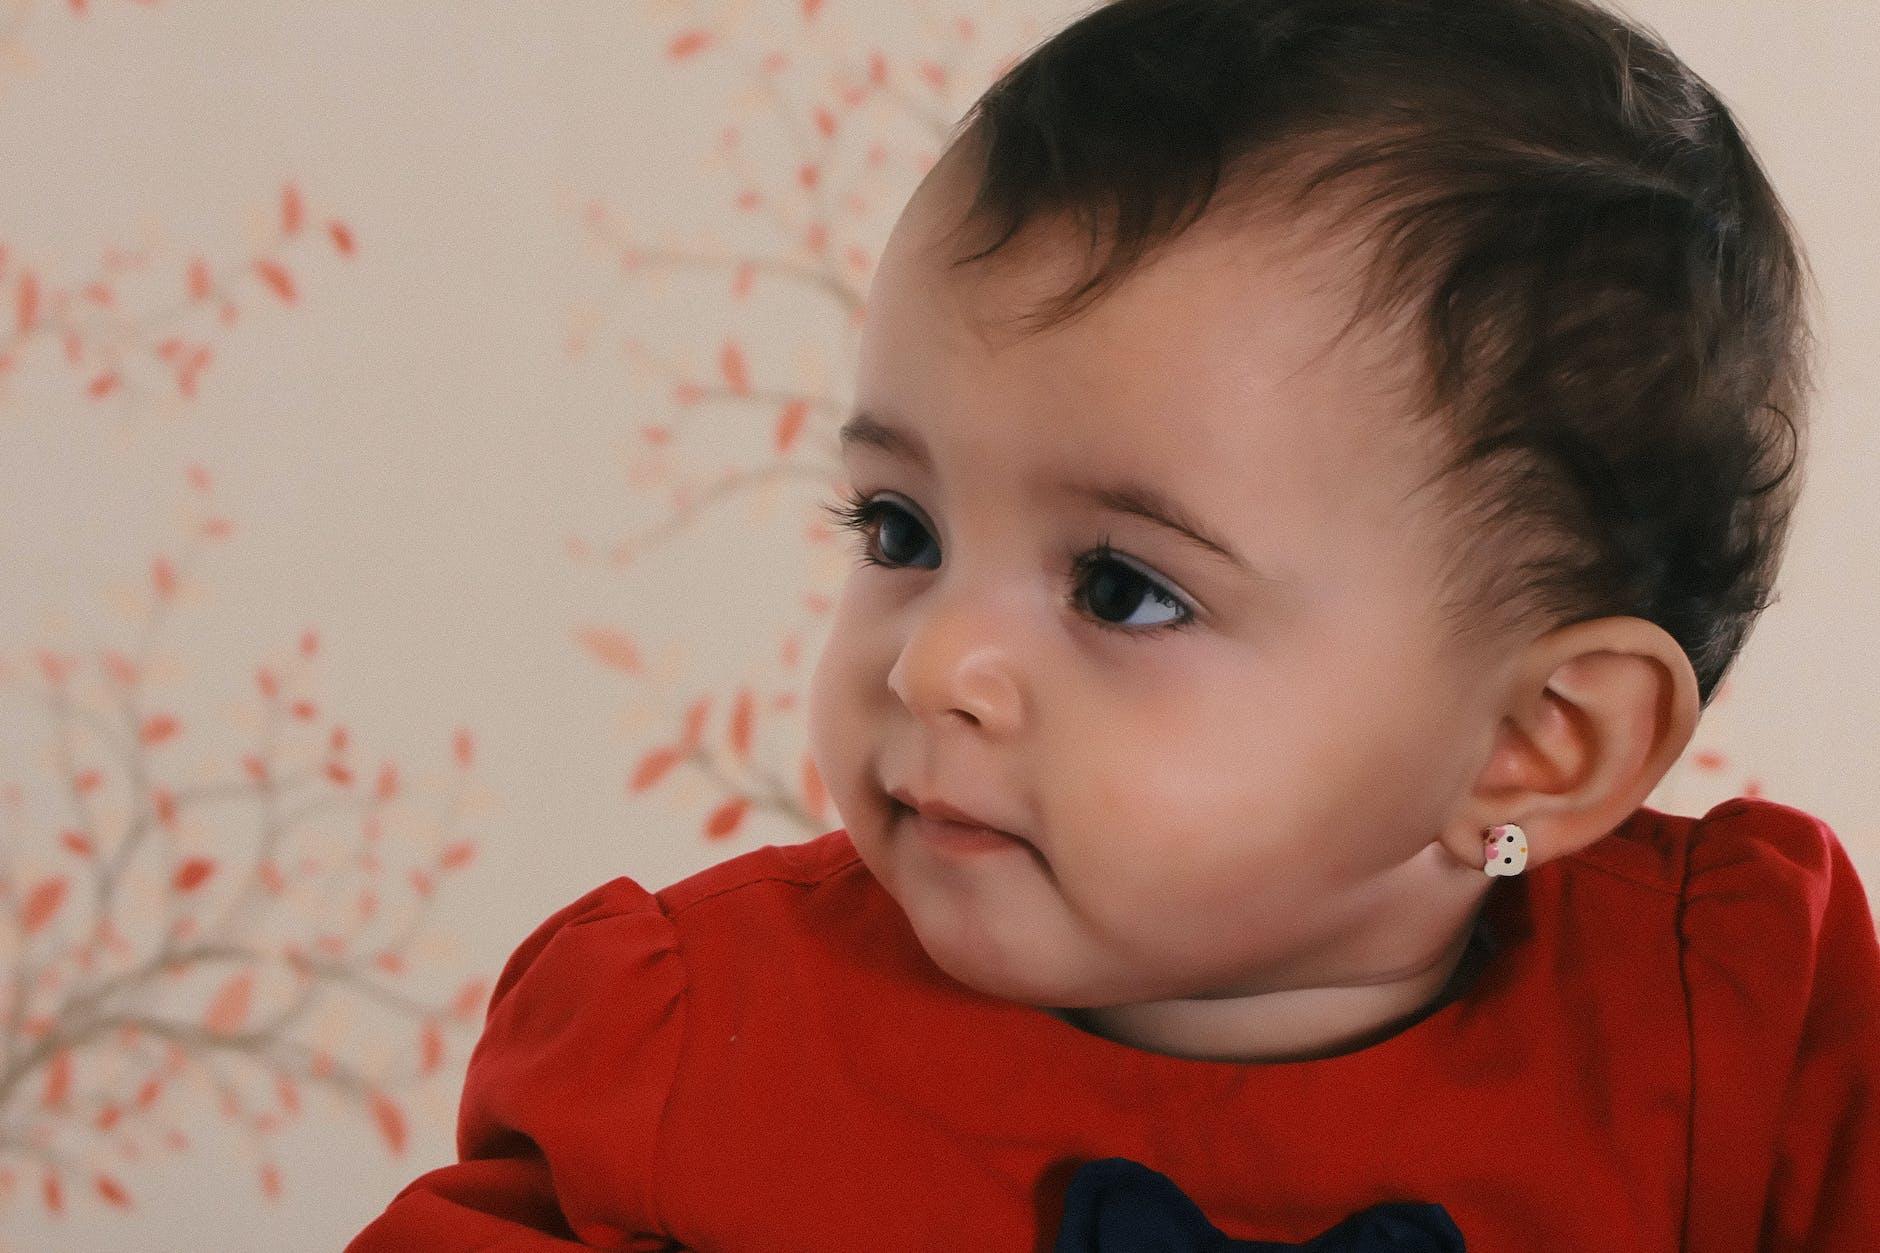 cute baby girl pic